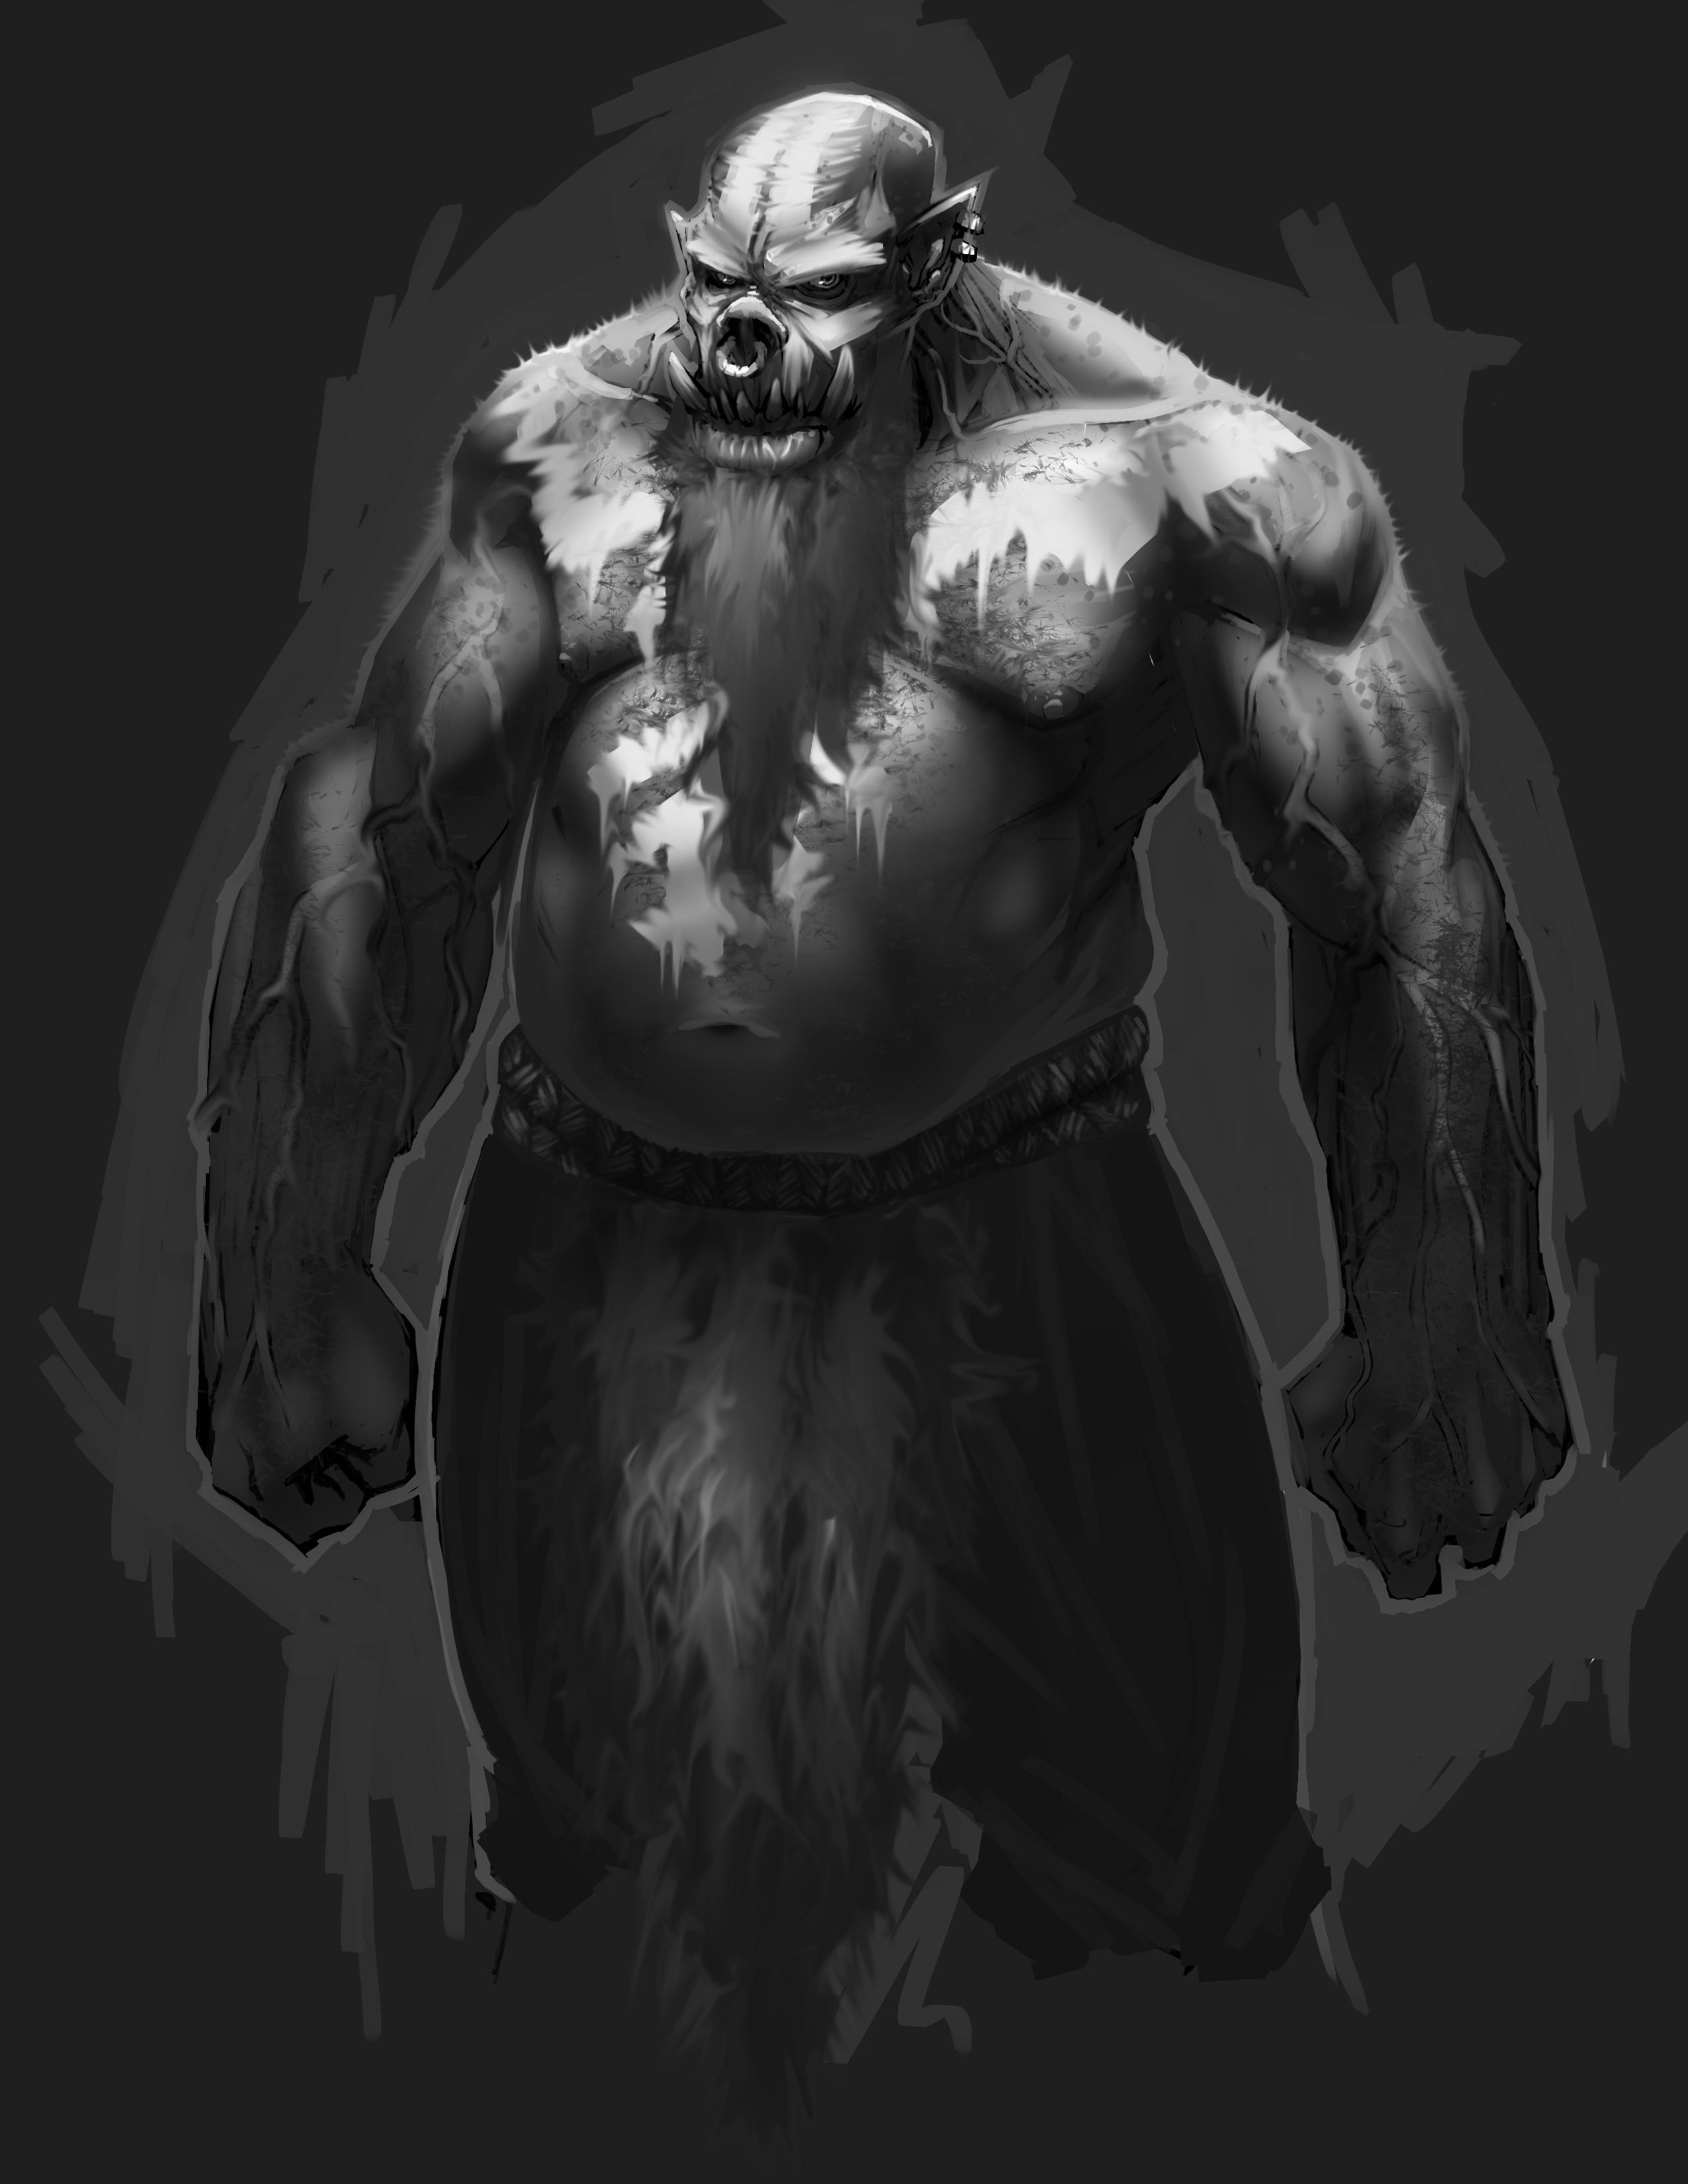 Base character with warpaint, grey beard and loincloth